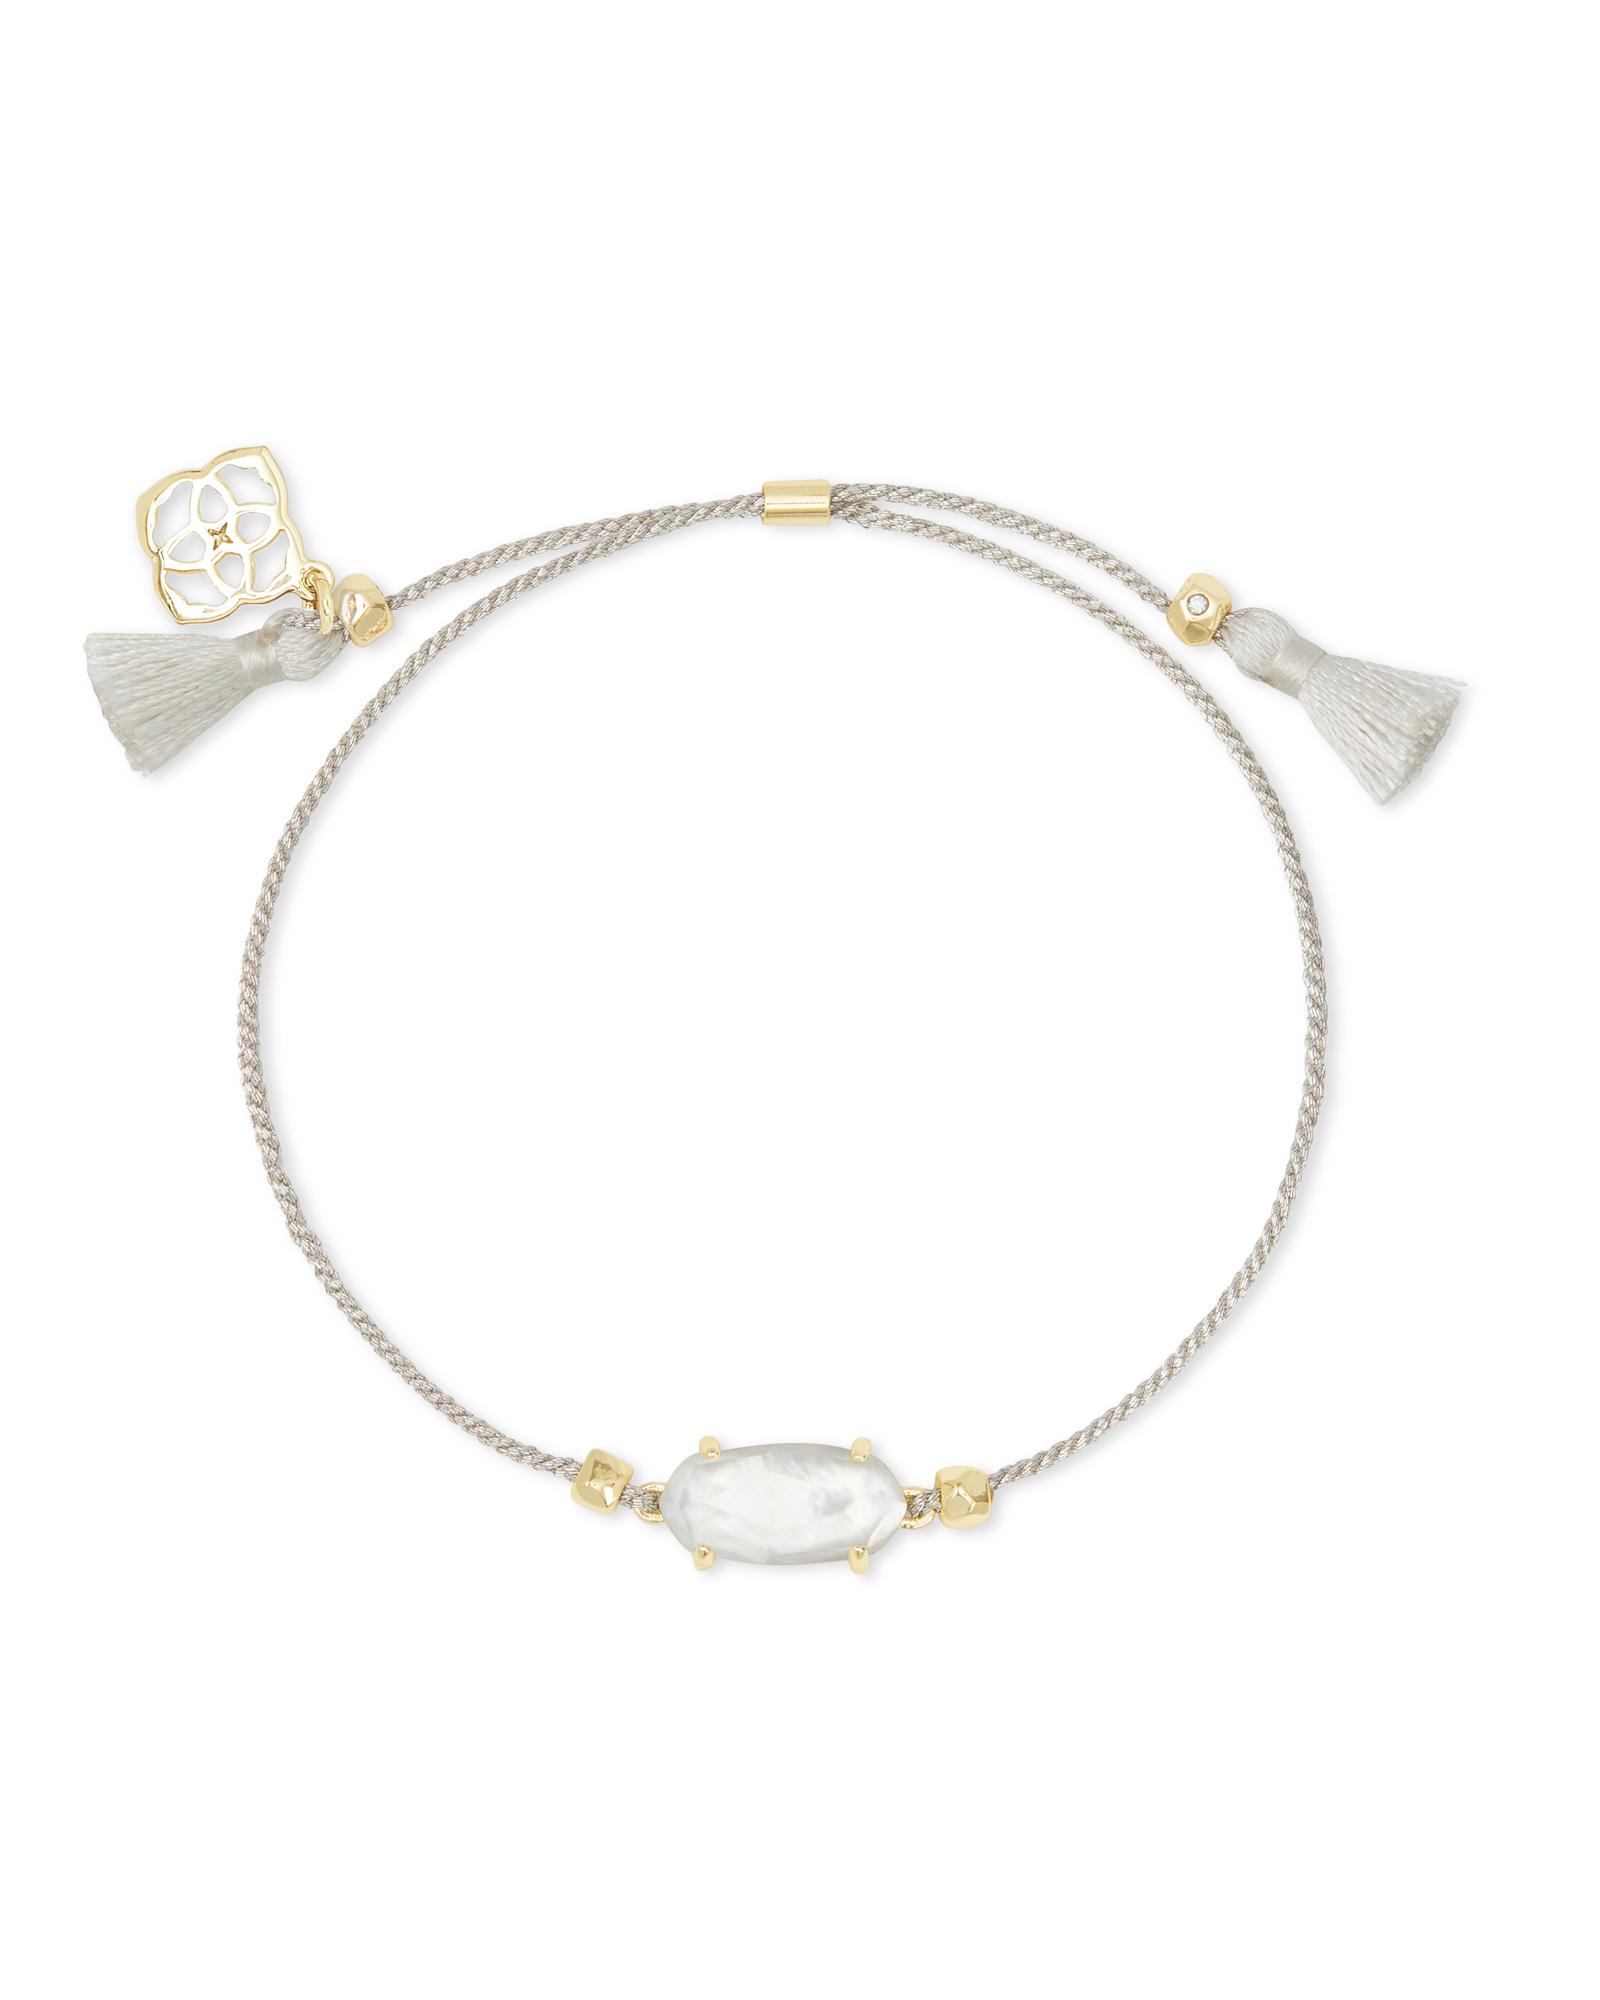 Ivory and gold kendra scott bracelet